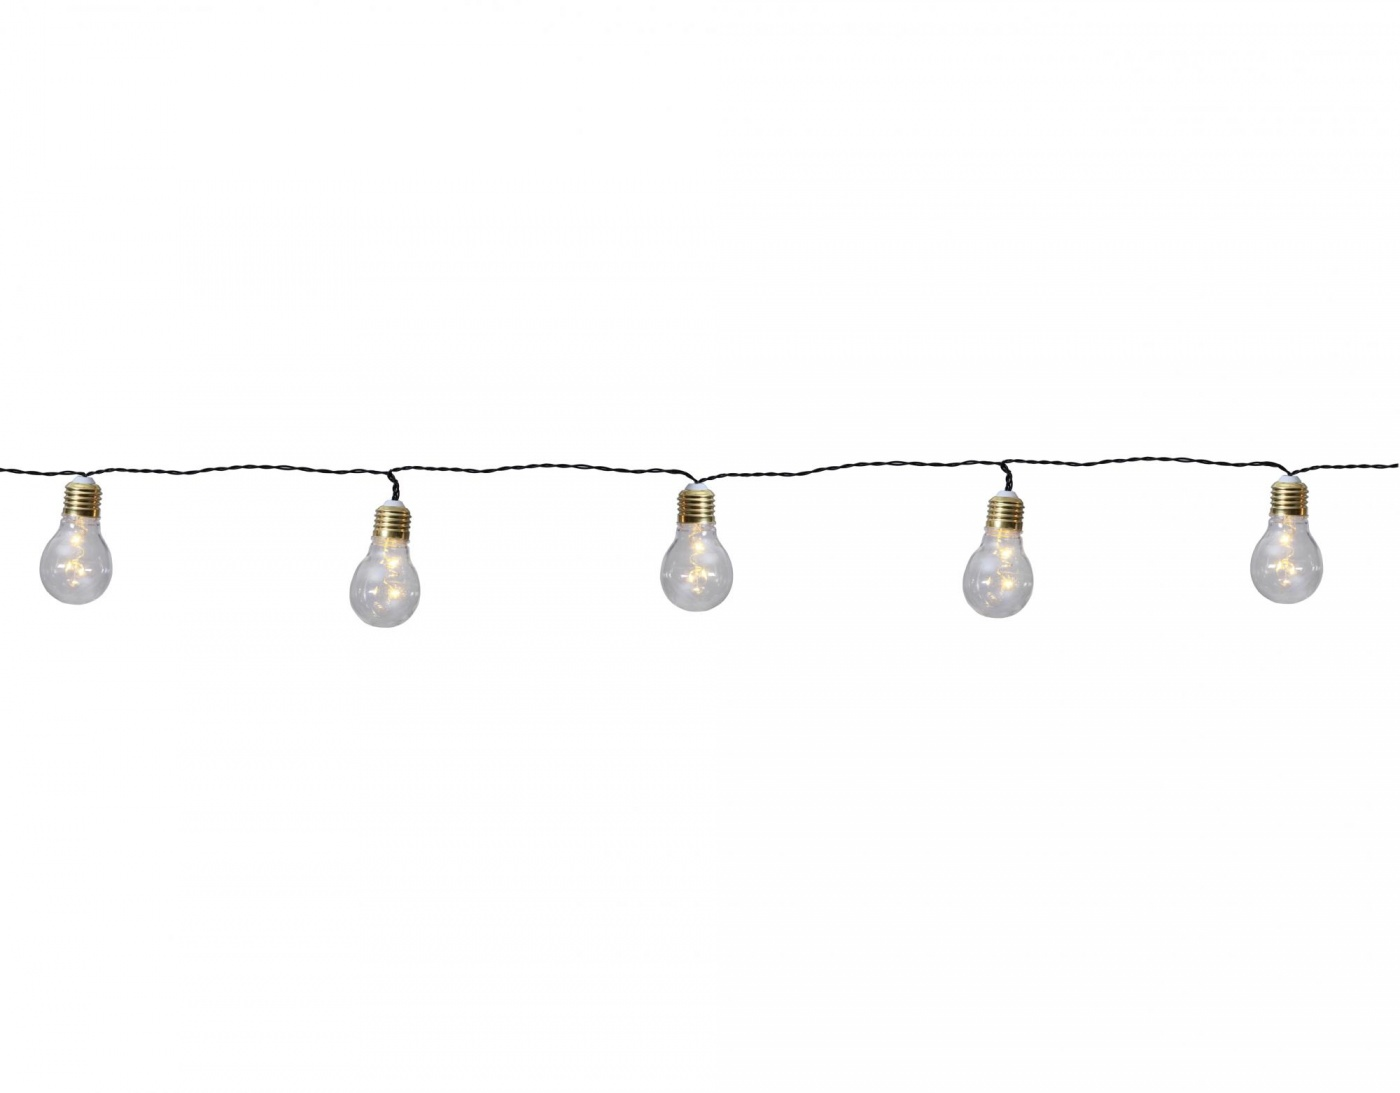 Svetlobna girlanda Silver Bulbs 100 cm